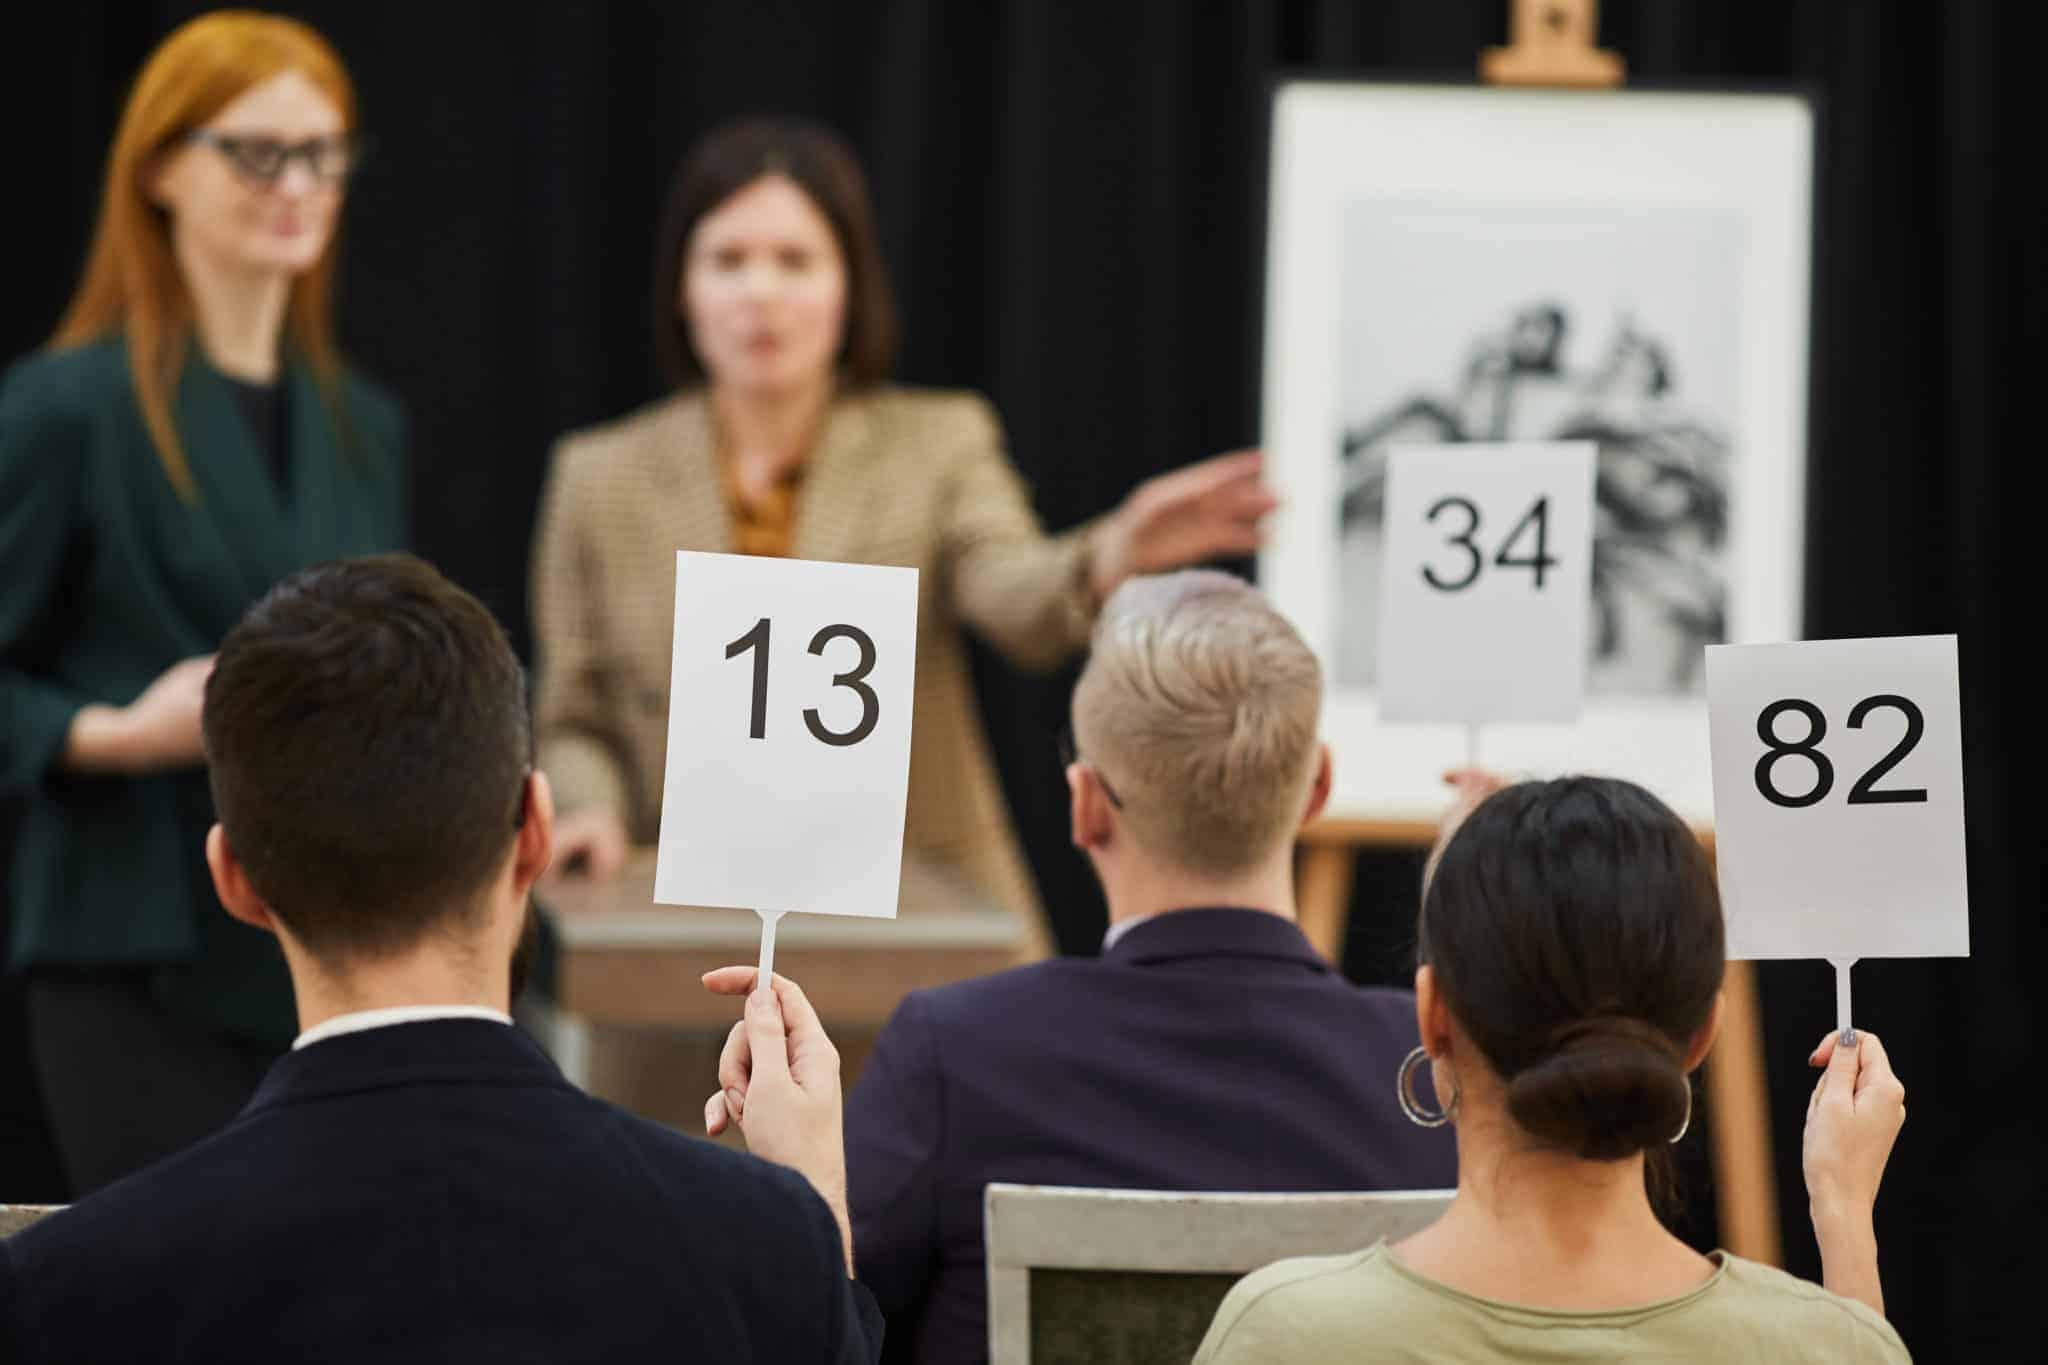 Do Incentivized Fundraising Auctions Raise More Money? How?